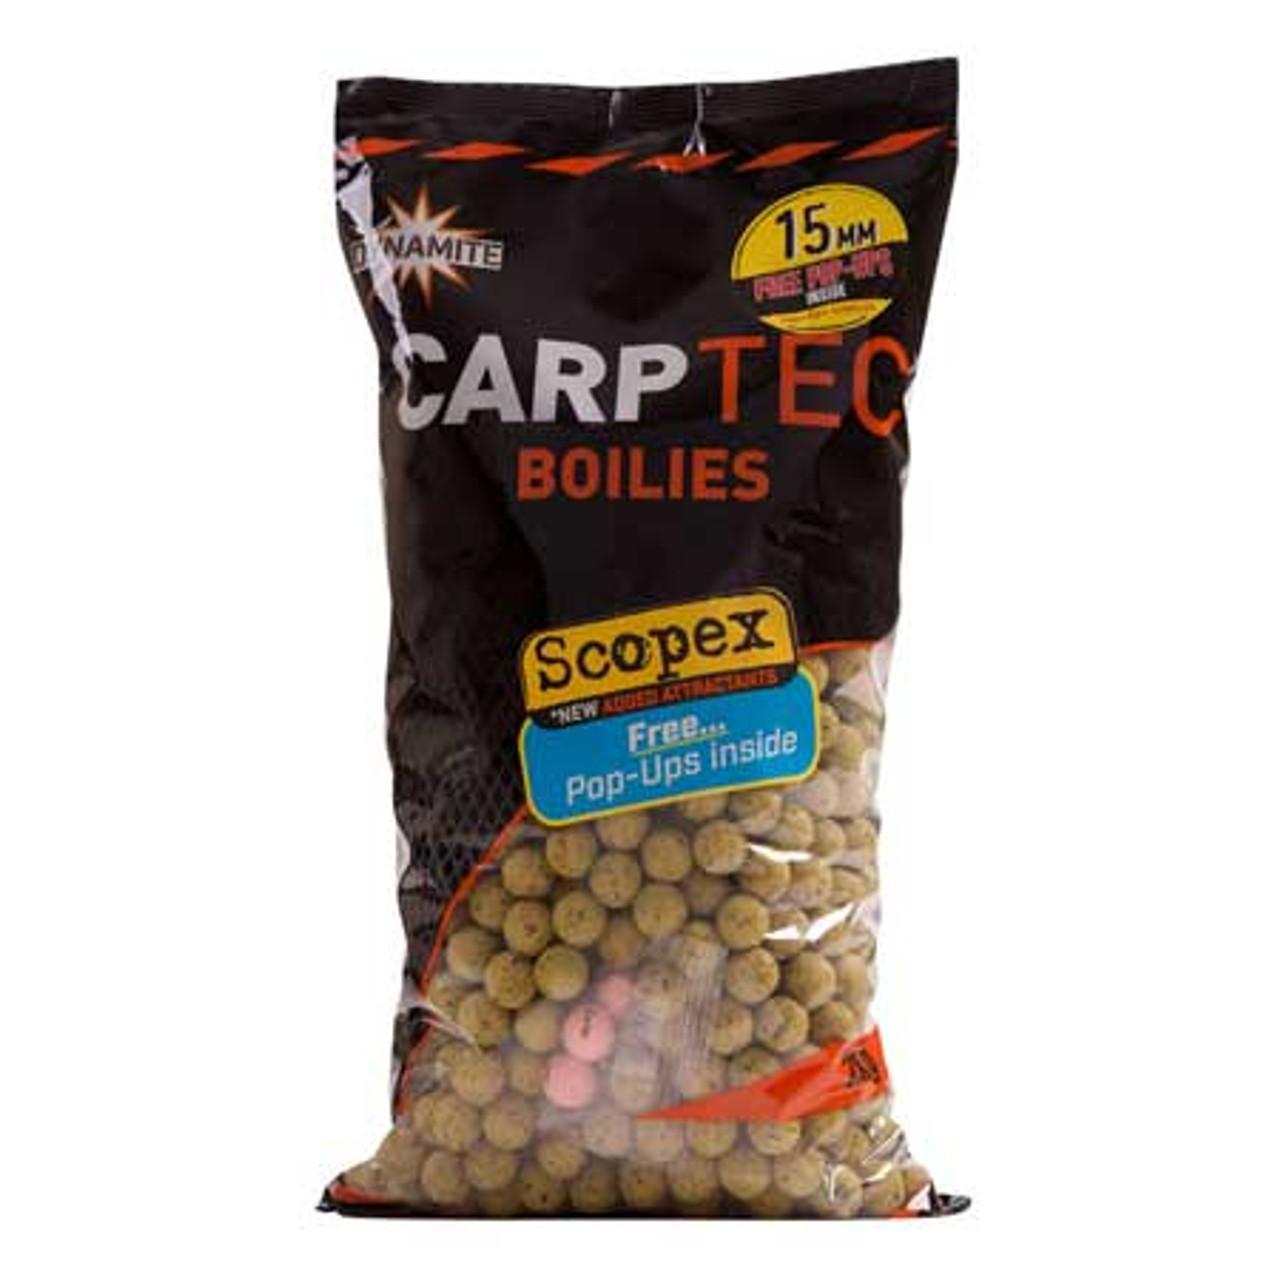 Dynamite Baits Carptec 2kg Scopex Boilies + Free Pop Ups